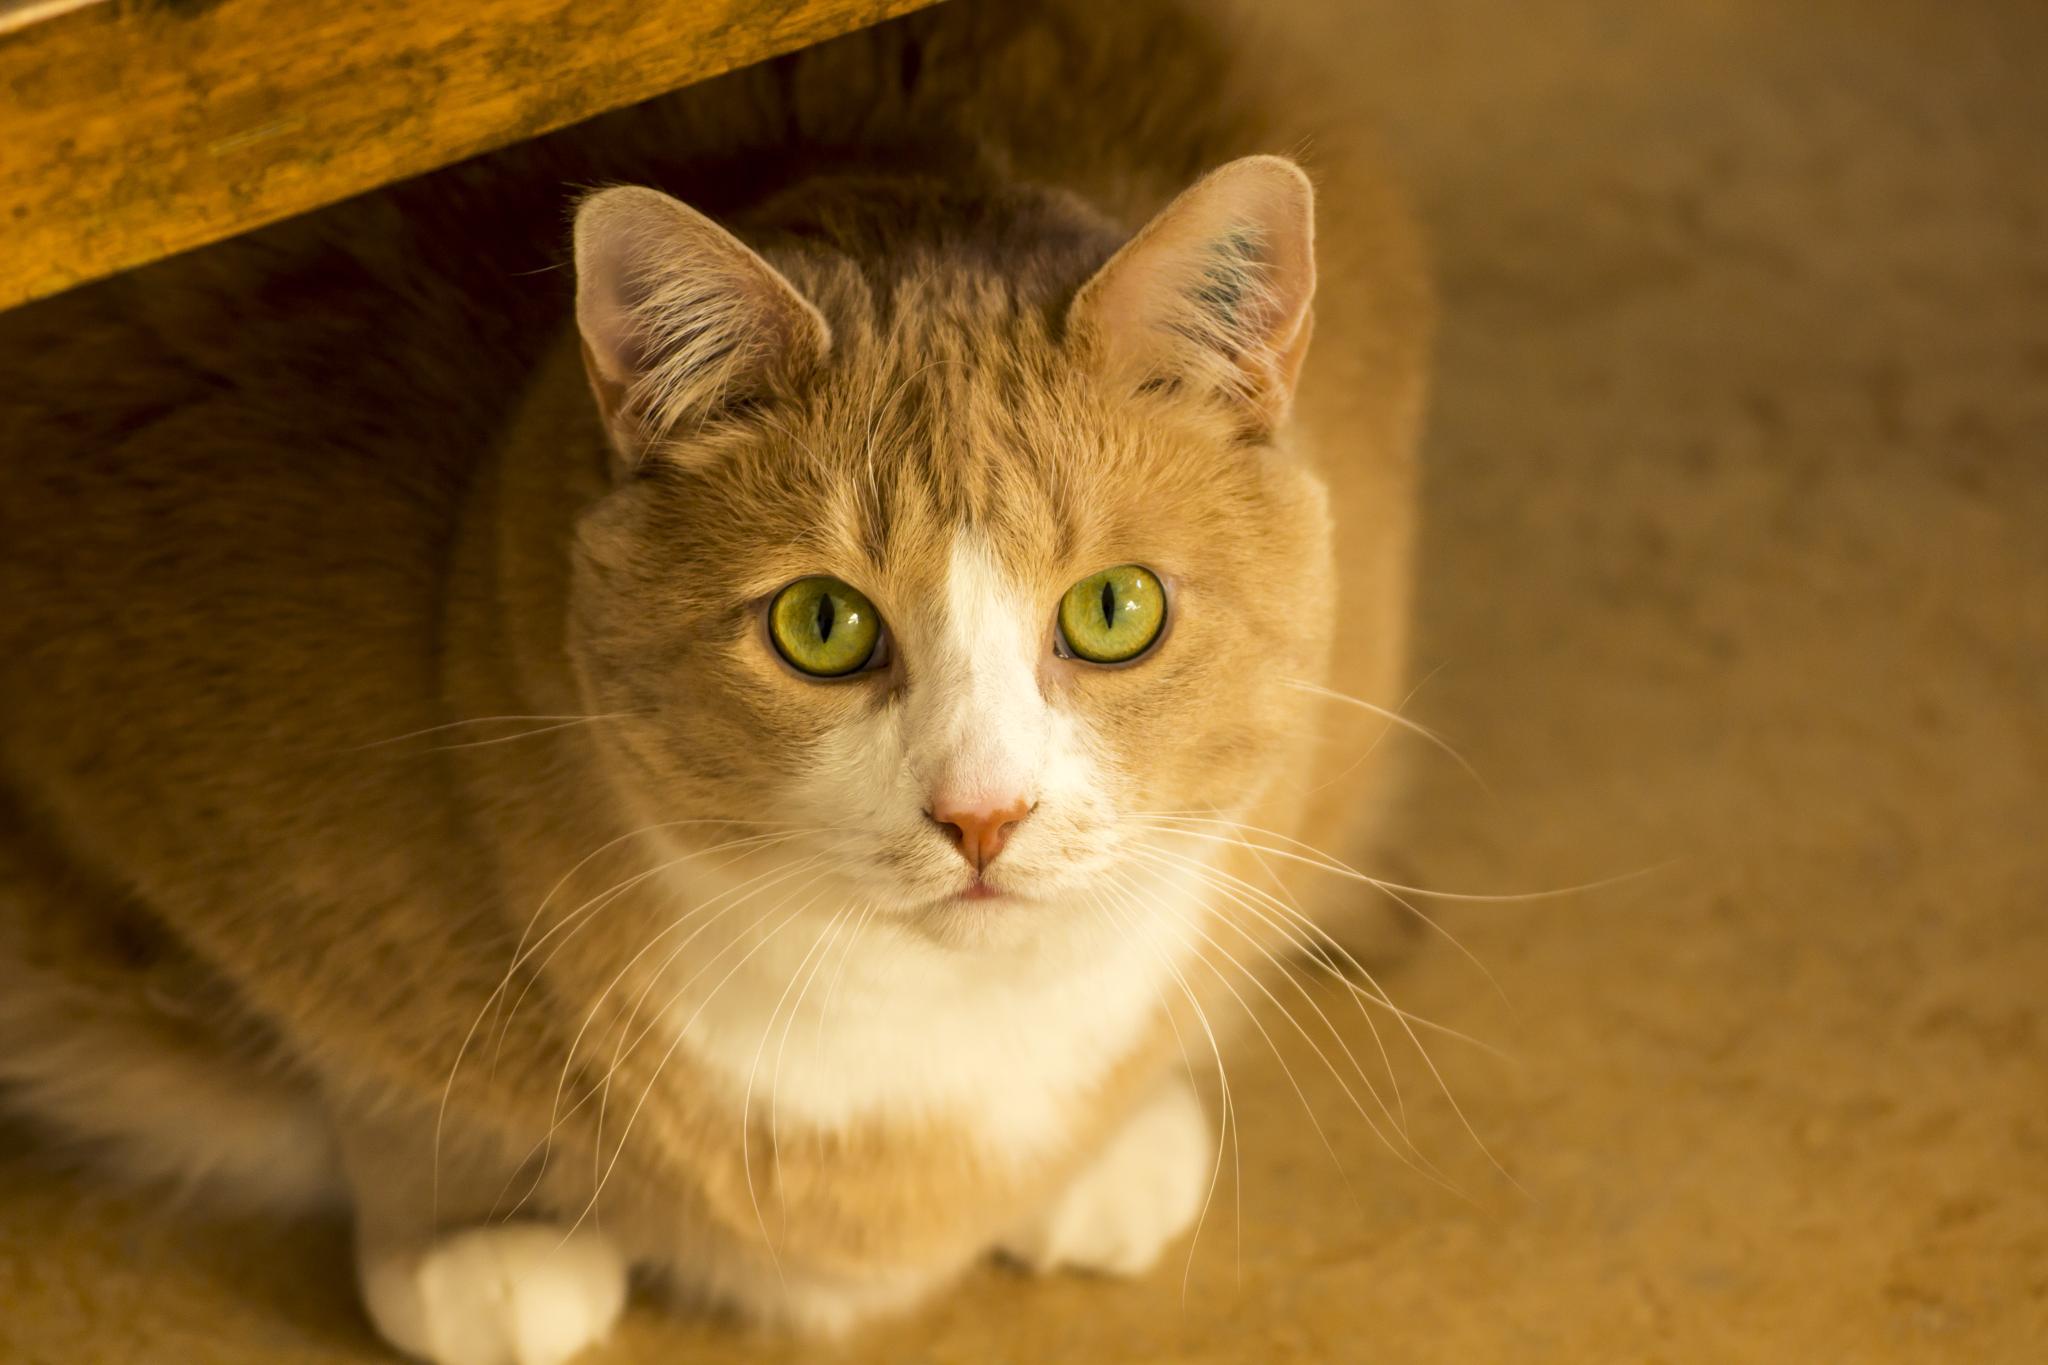 Cat by Daniel Paulsson